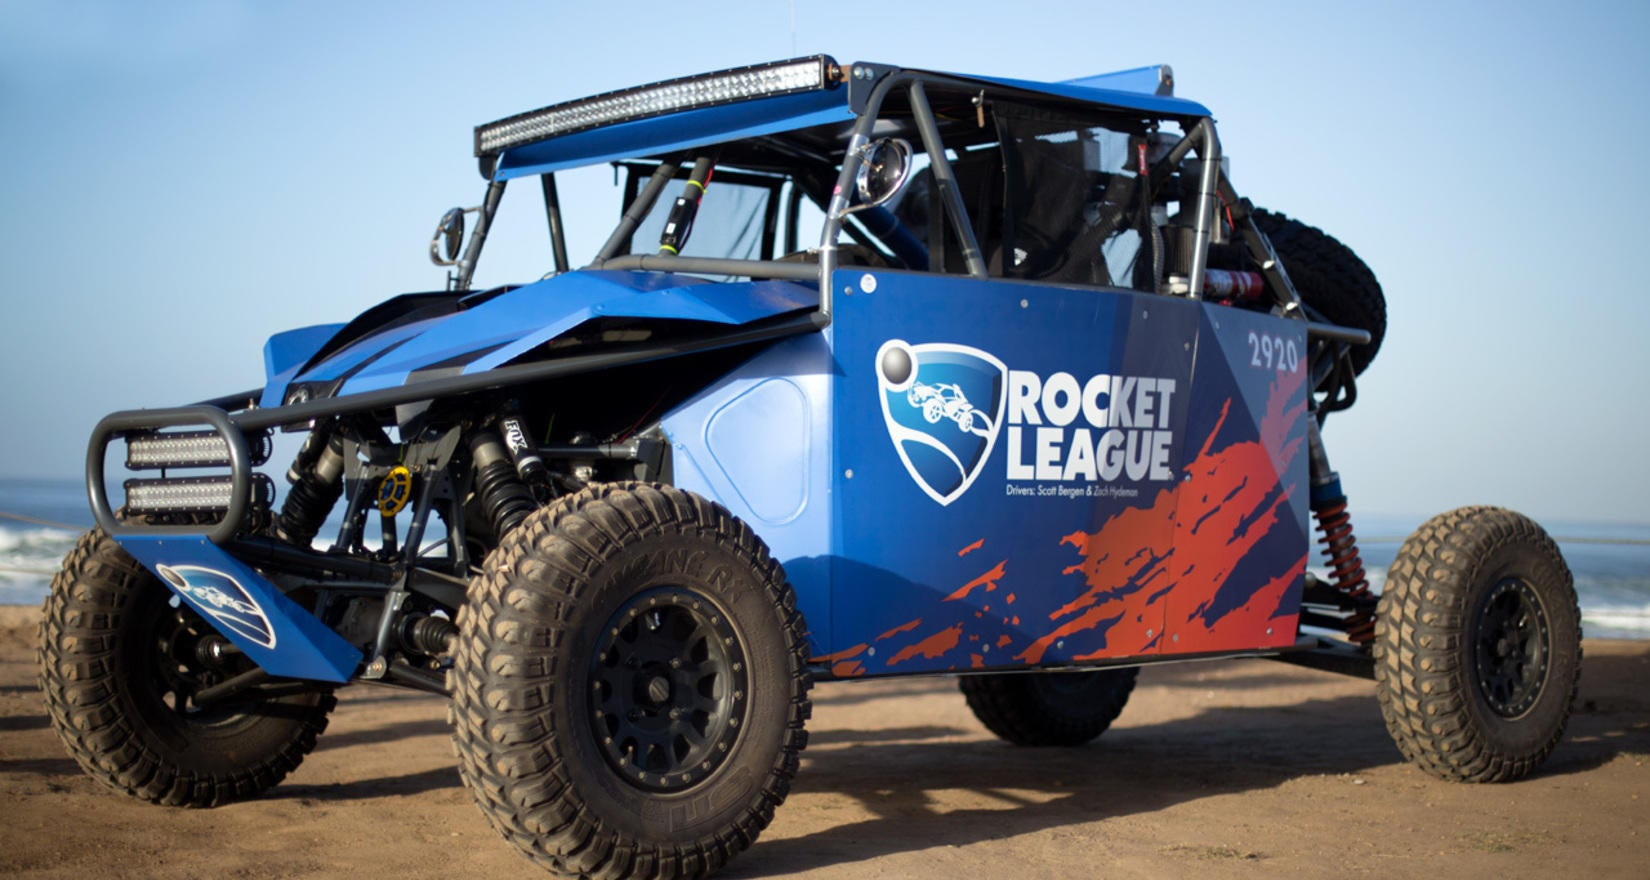 Team Rocket League <br> Takes On The Baja 1000 Image